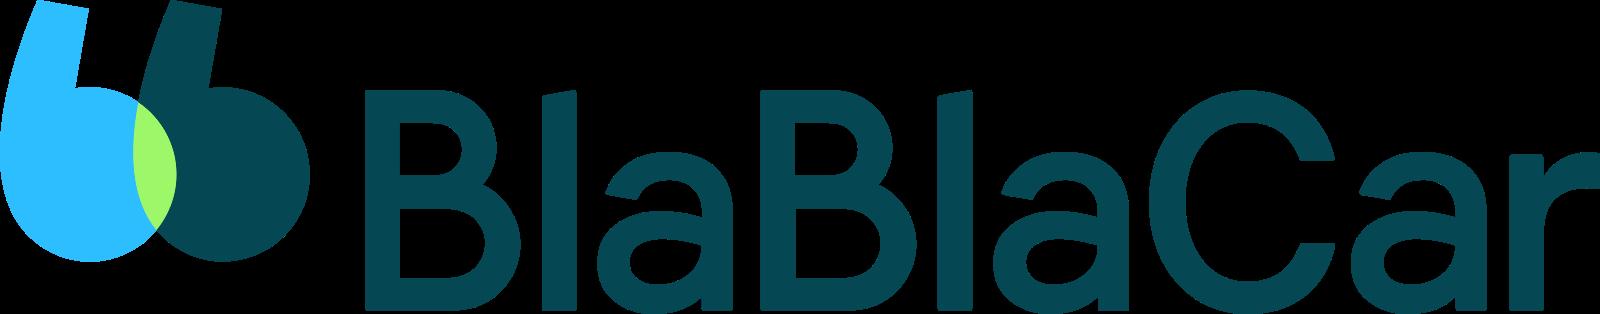 blablacar-logo-4